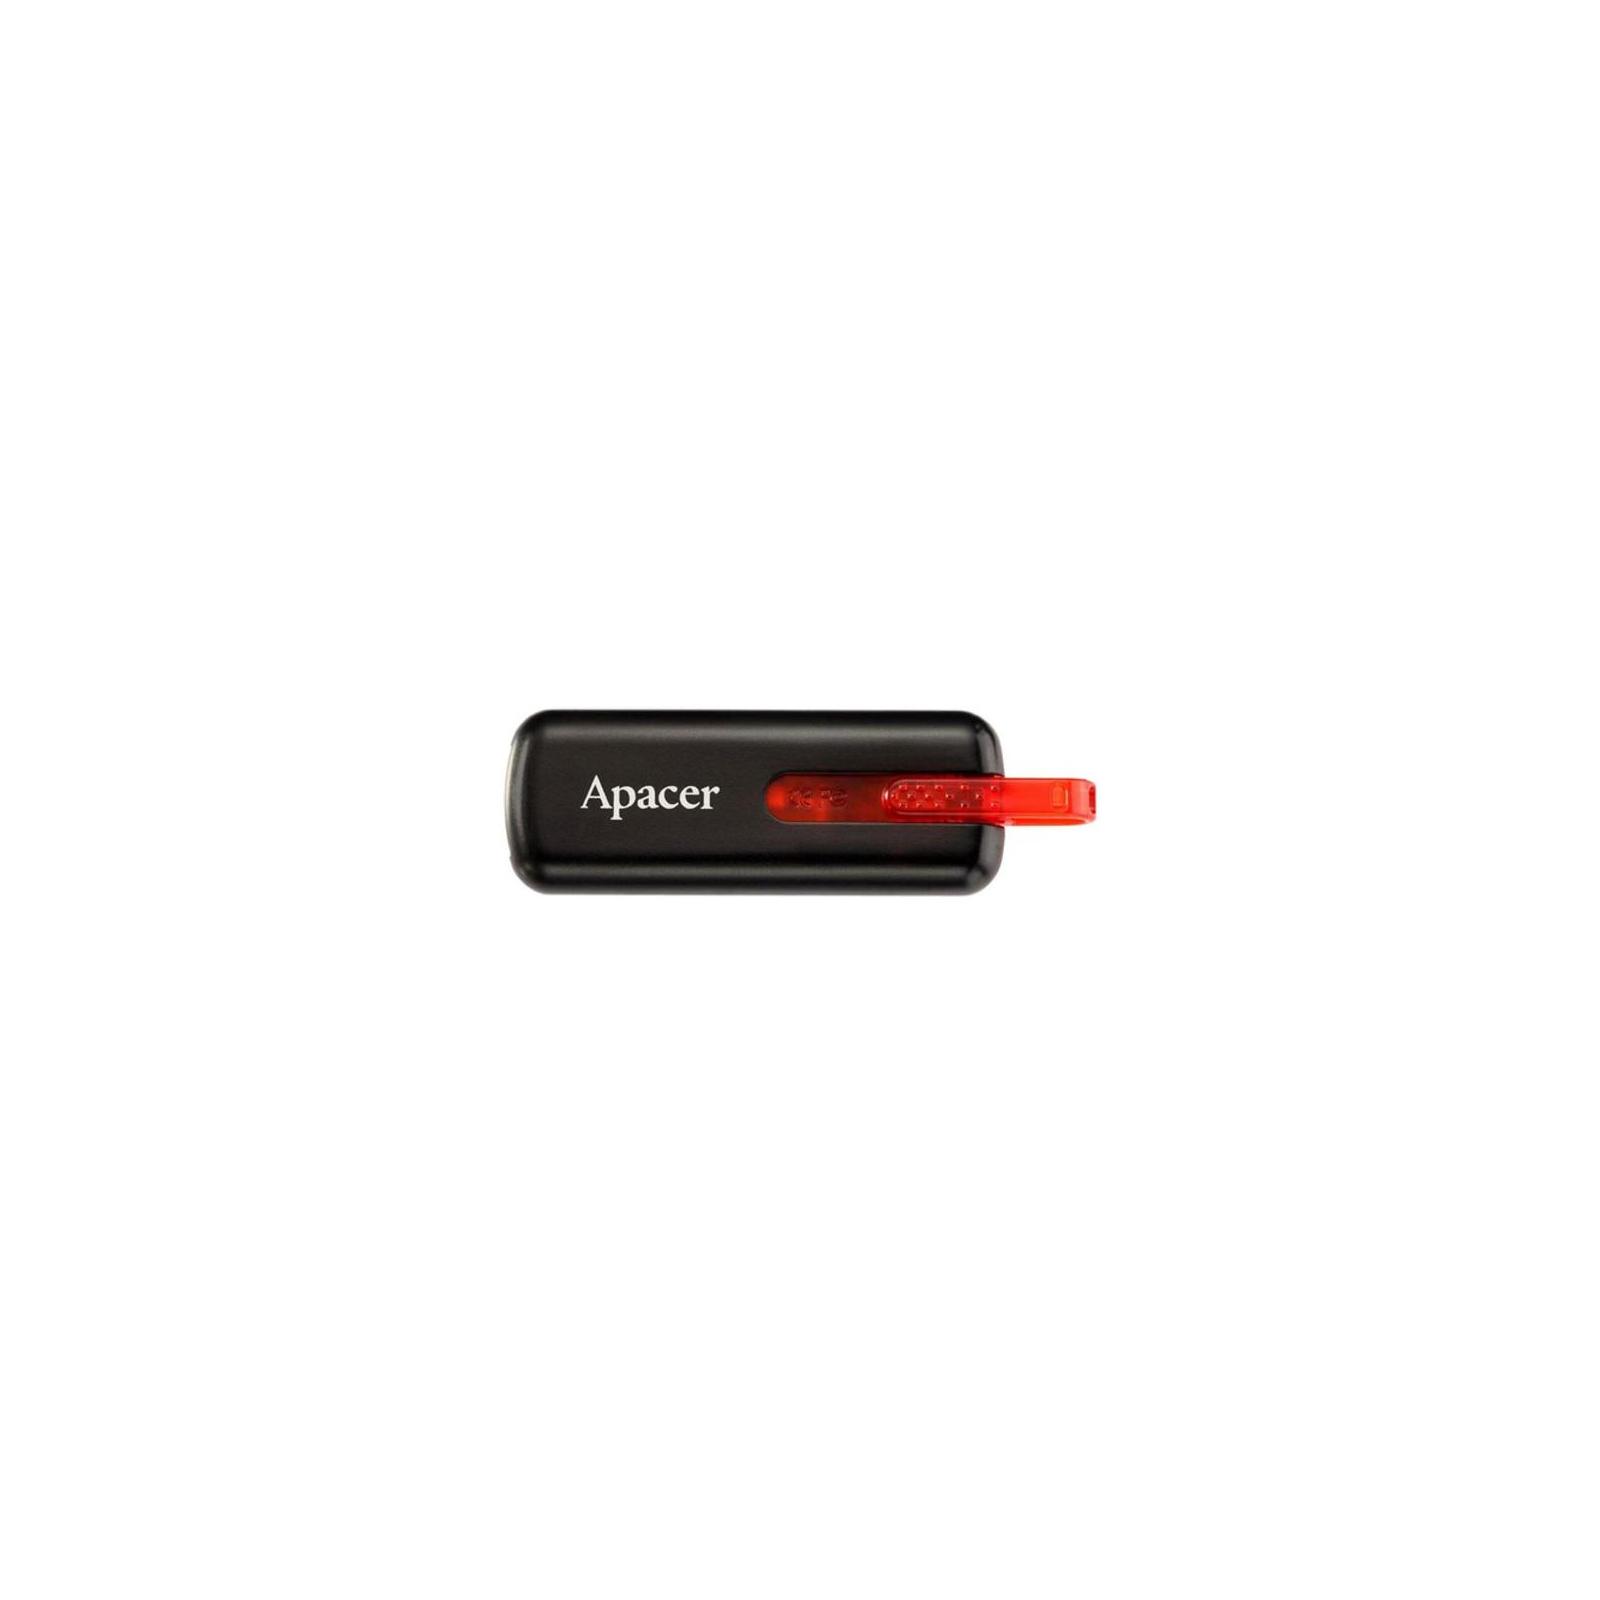 USB флеш накопитель Handy Steno AH326 black Apacer (AP16GAH326B-1) изображение 3